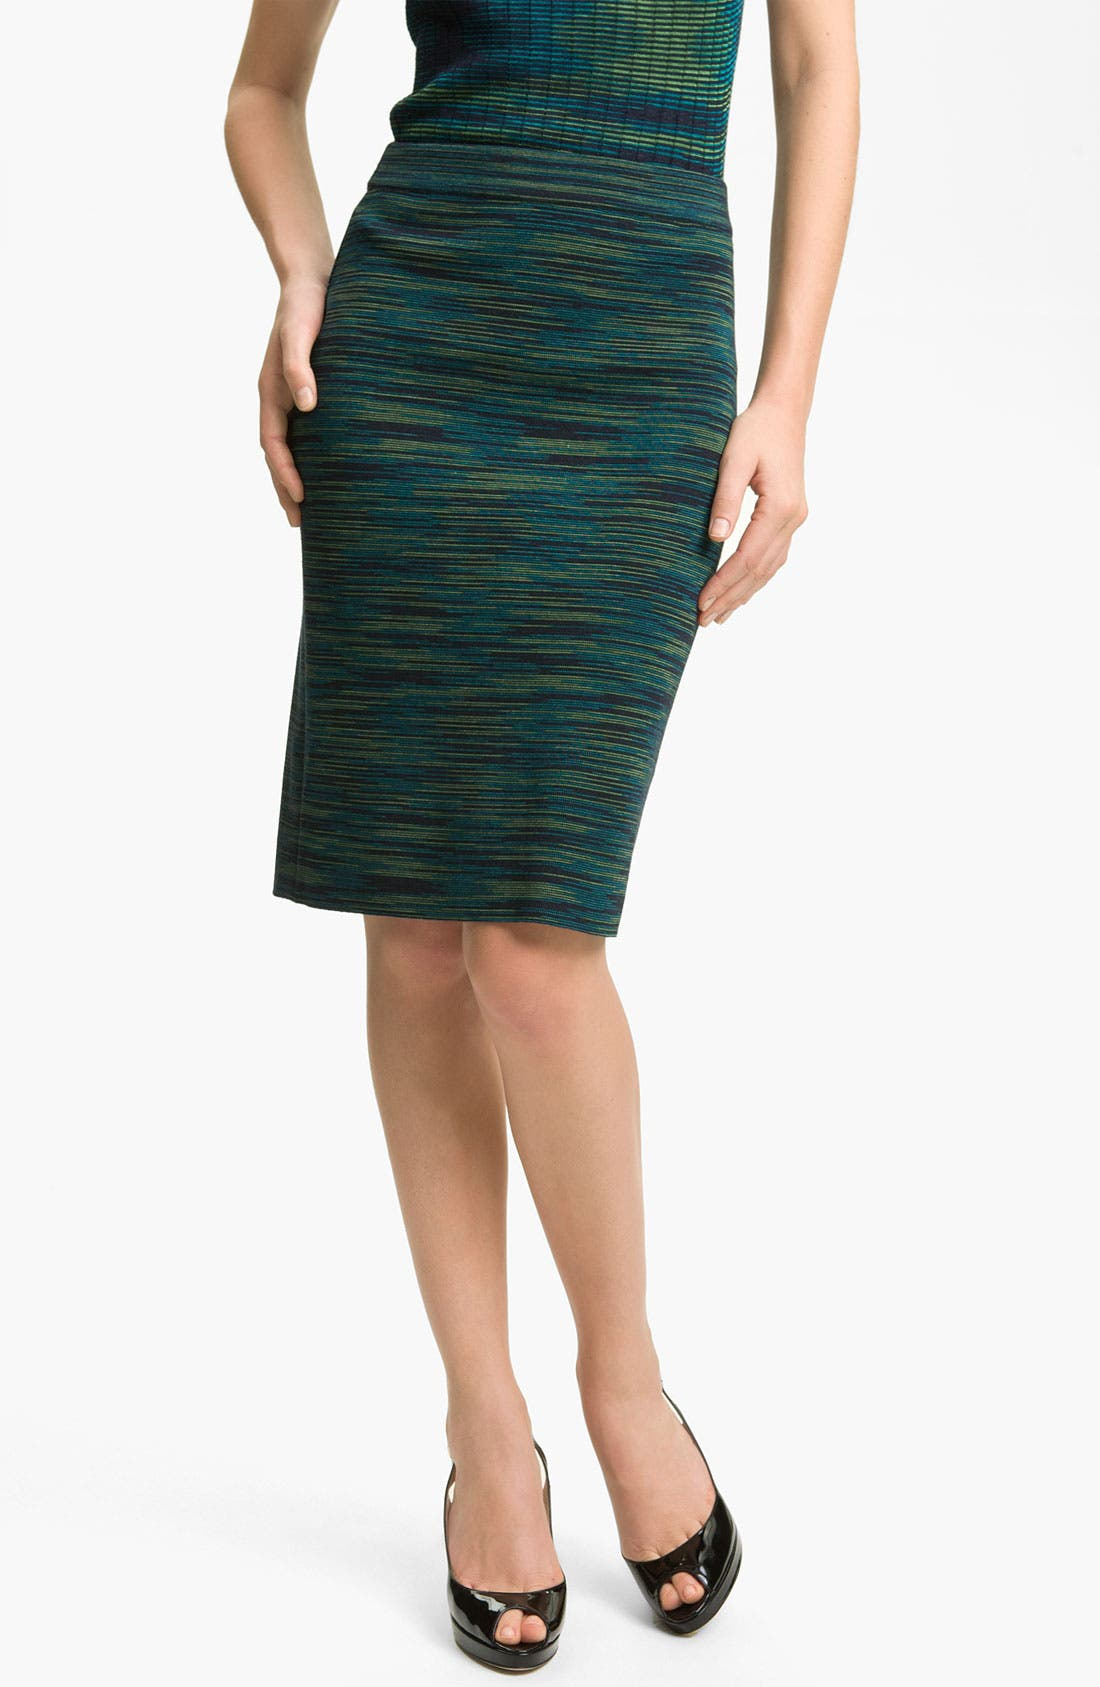 Alternate Image 1 Selected - M Missoni Space Dye Pencil Skirt